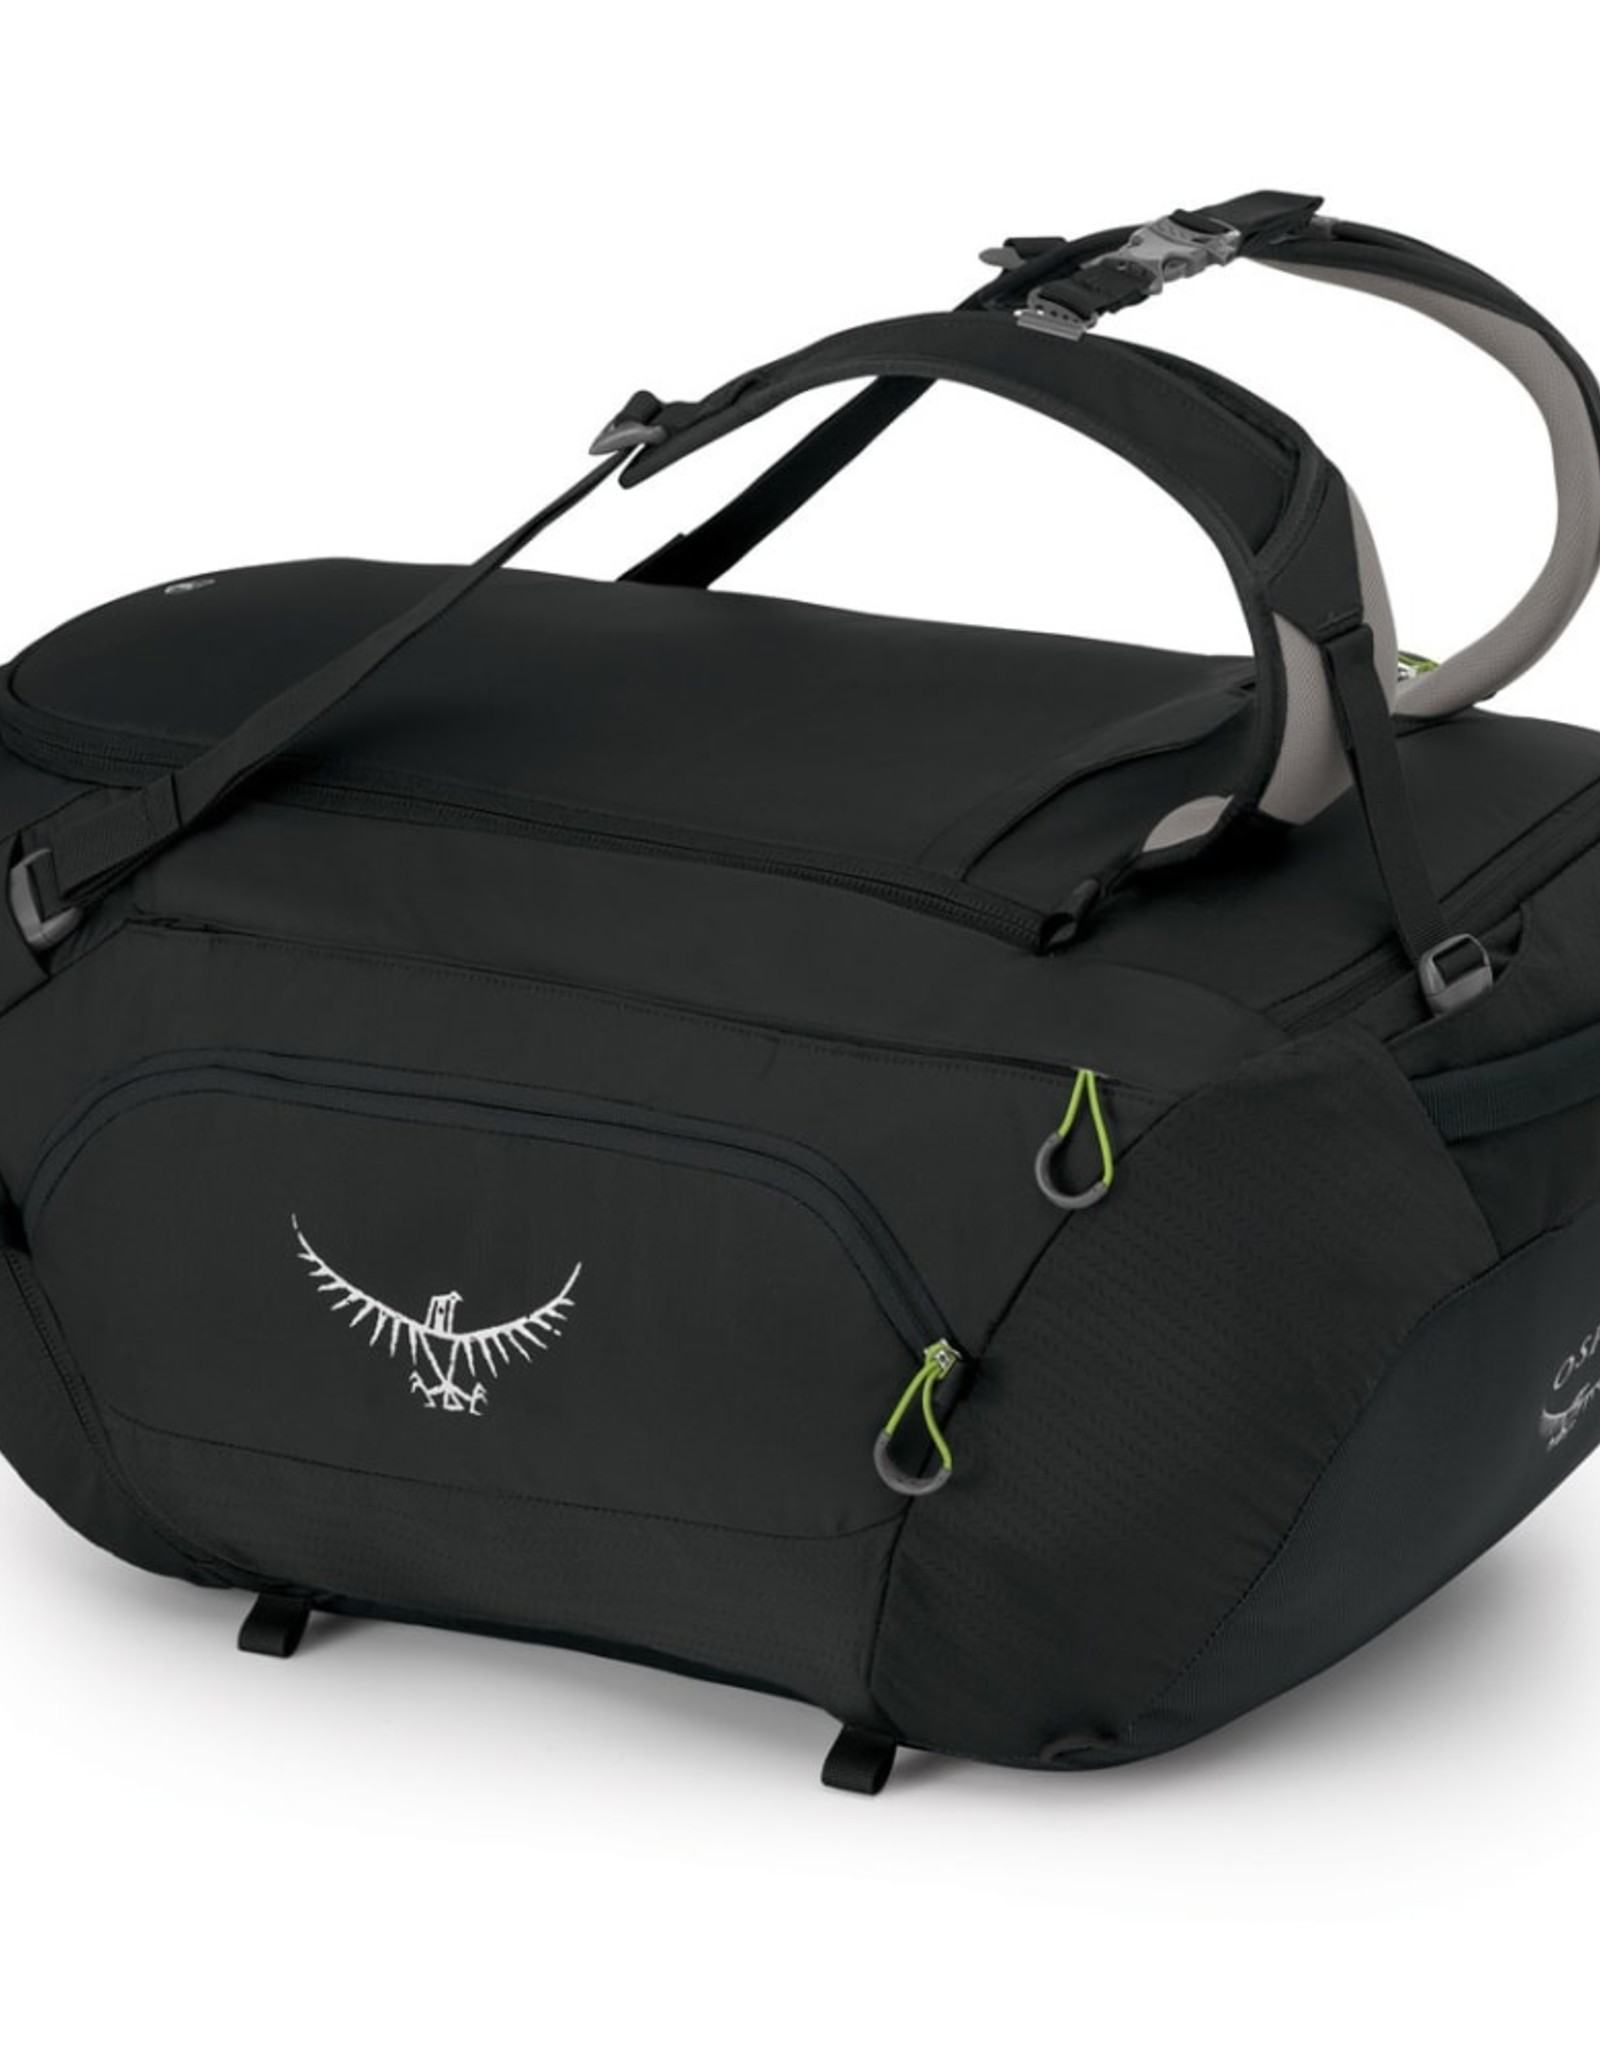 Osprey Osprey BigKit Duffel - Anthracite Black